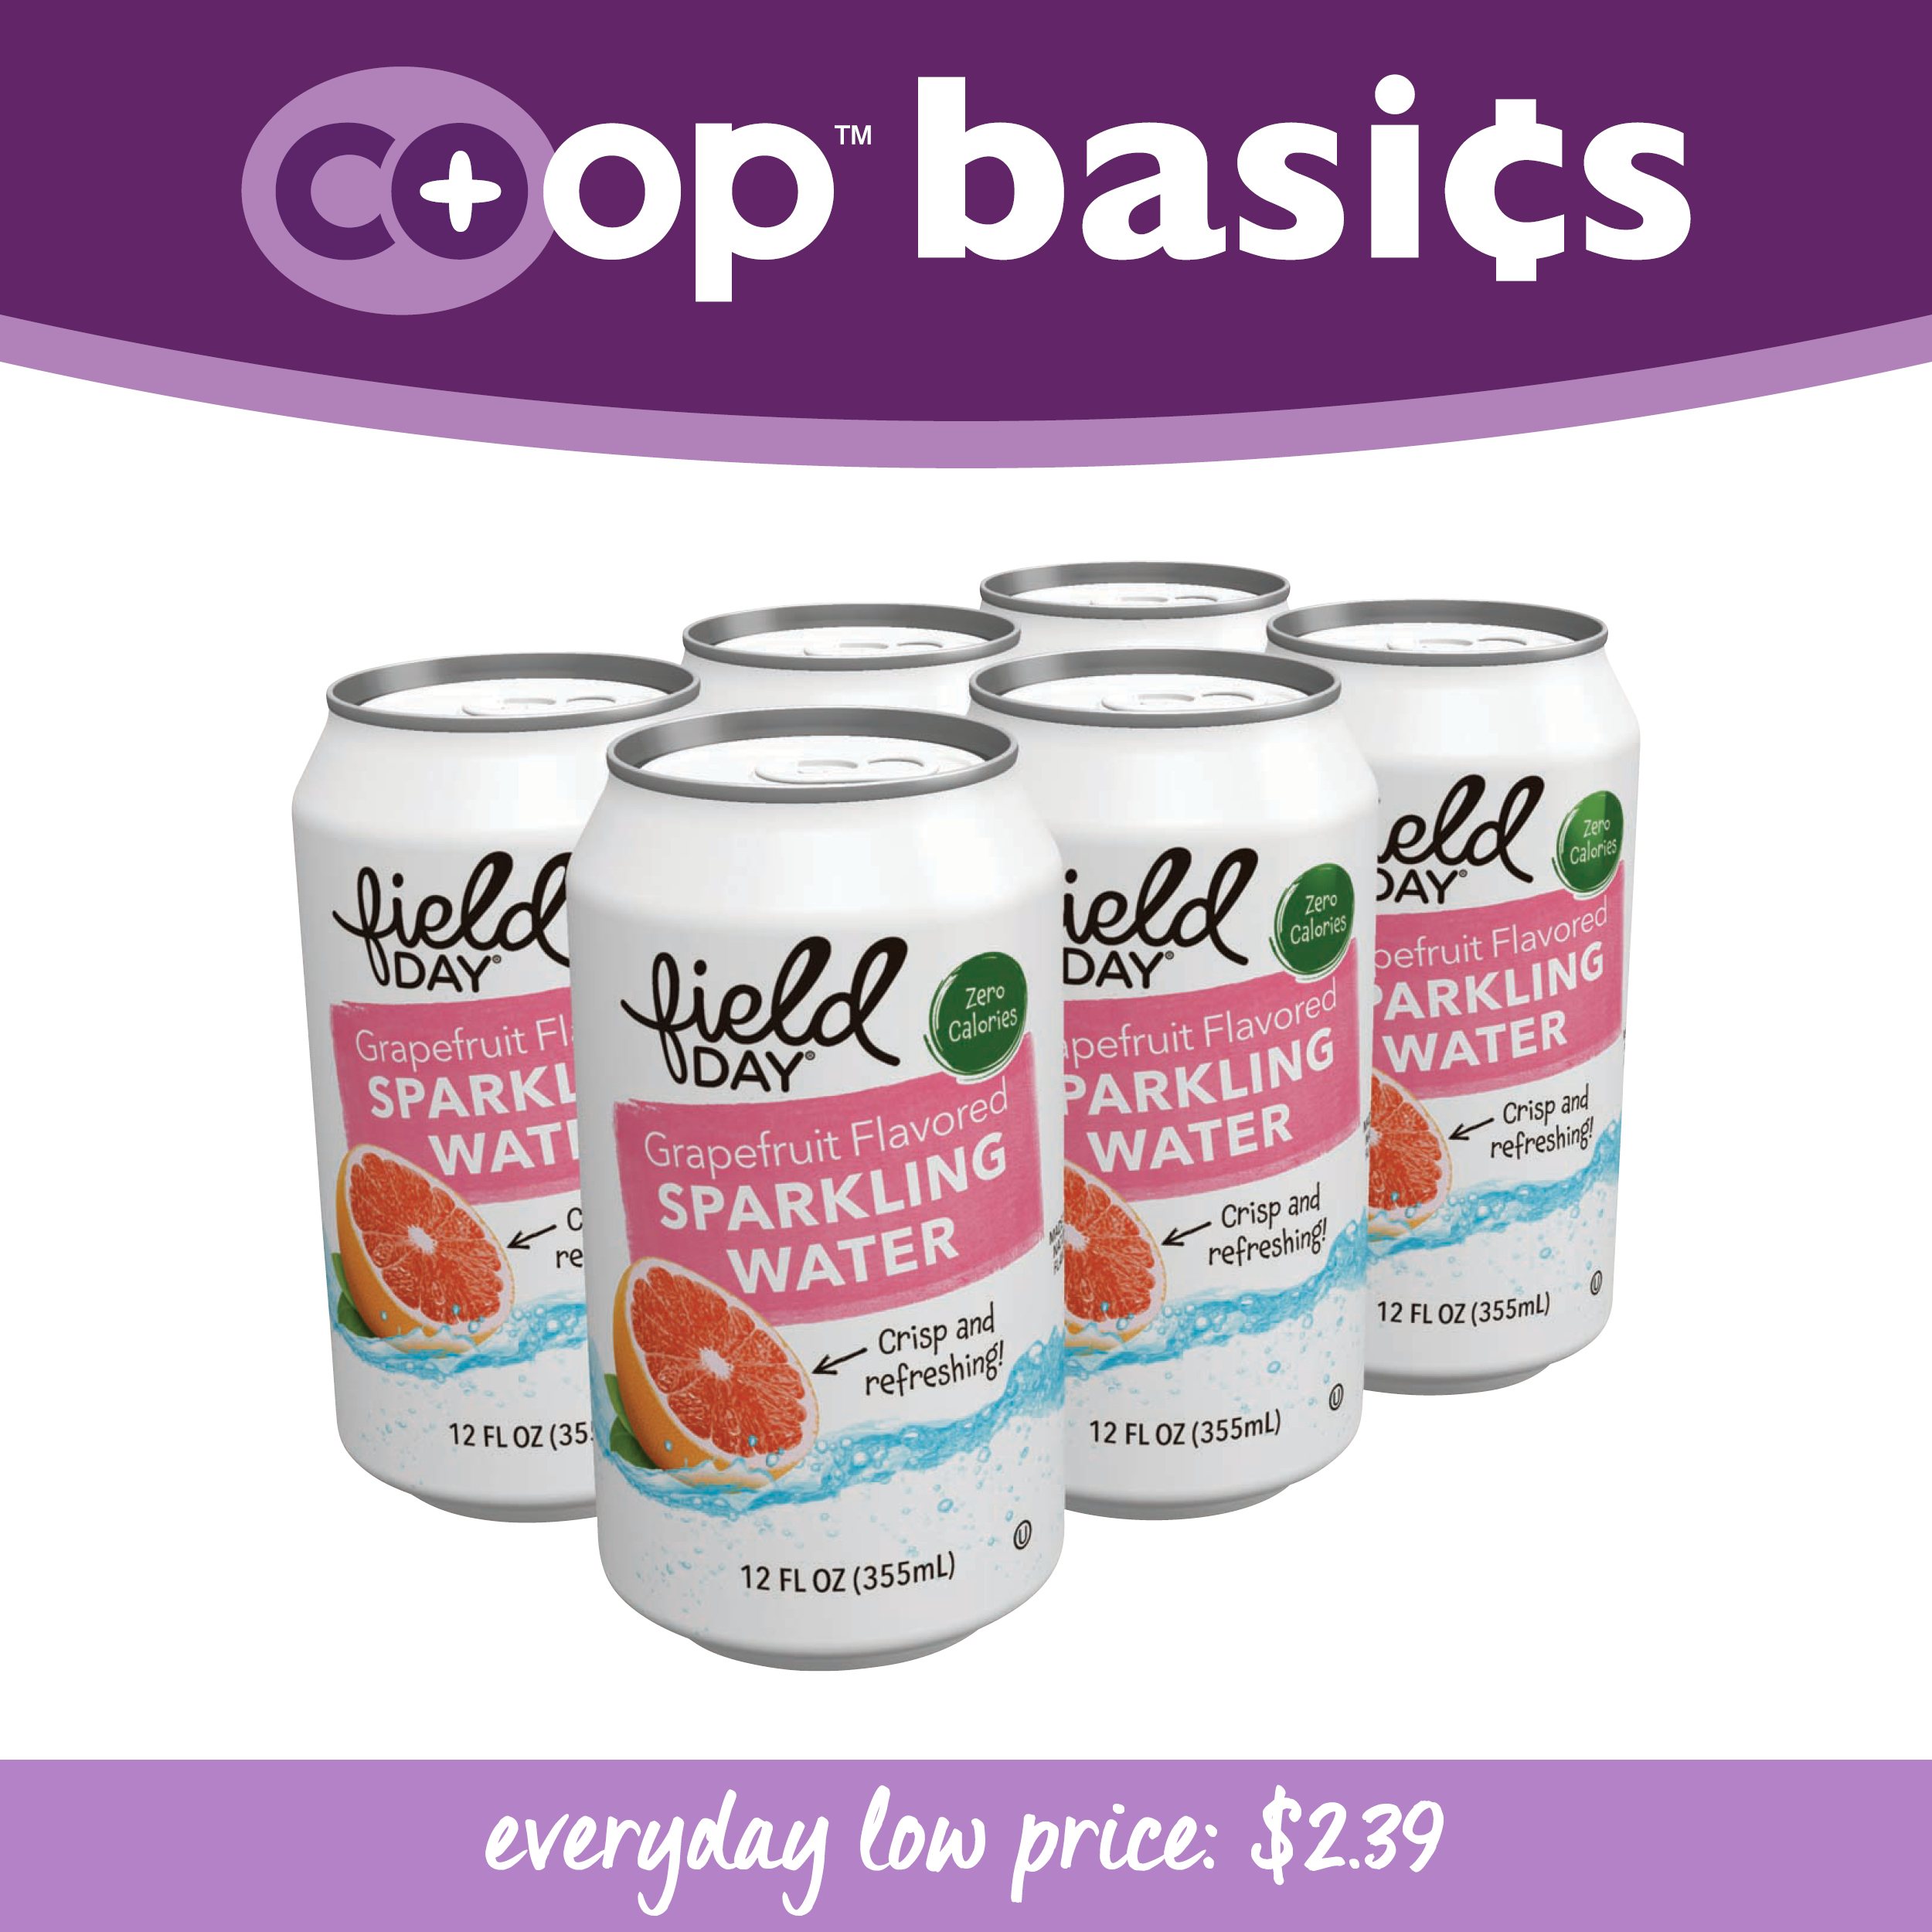 Sparkling_Water_Grapefruit_6pack.jpg